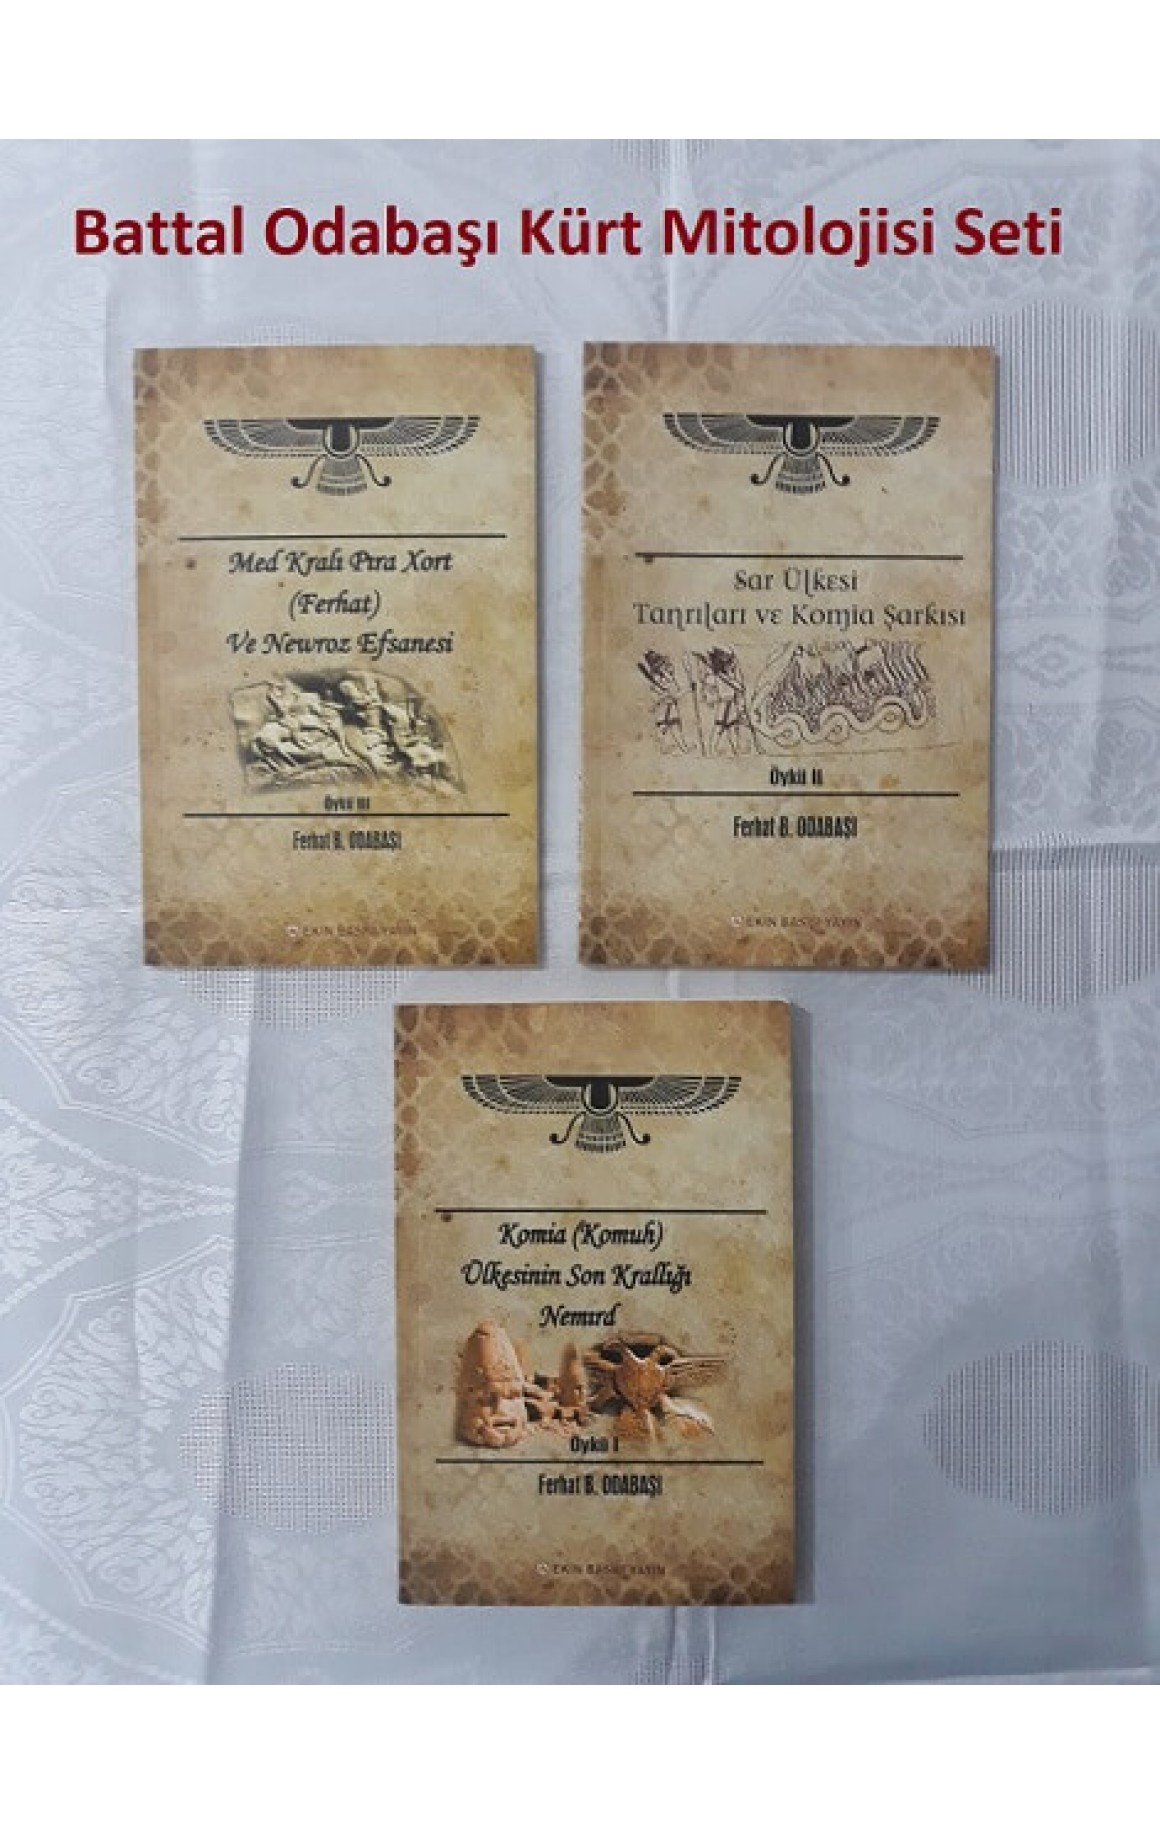 Battal Odabaşı Kürt Mitolojisi Seti